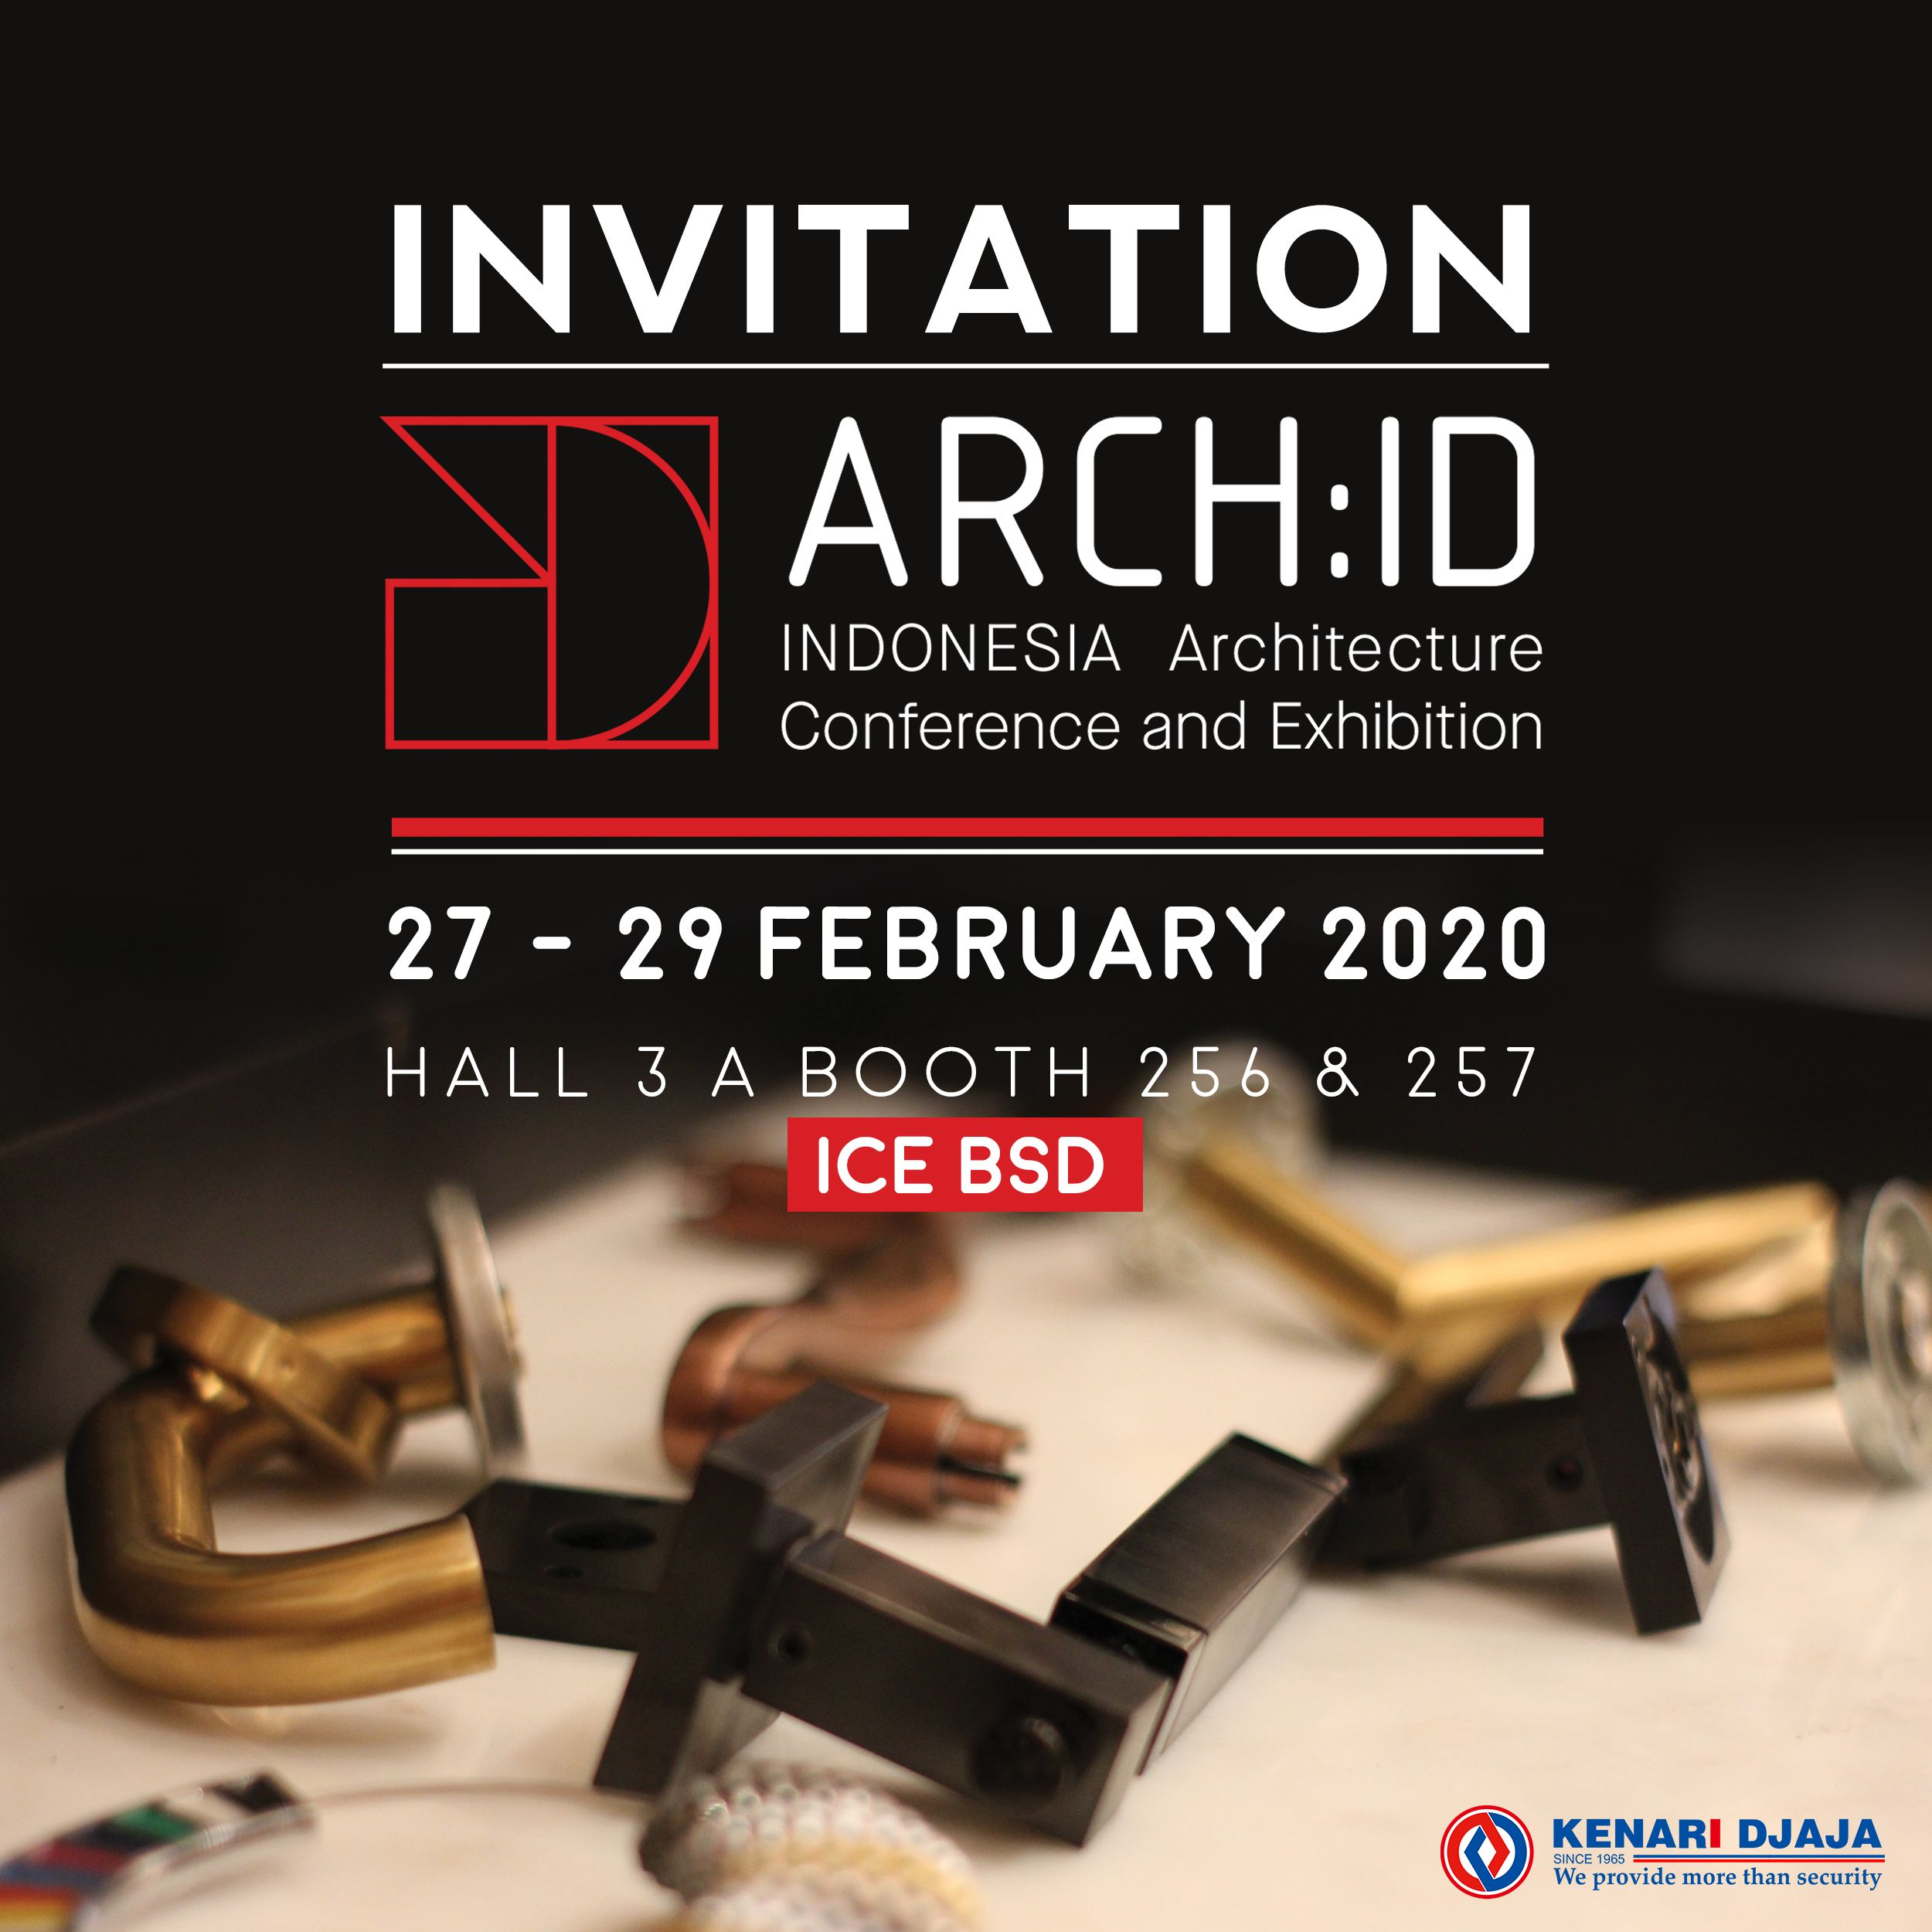 Pameran Arch.ID ICE Serpong di 2020 Indonesia, Tanggal